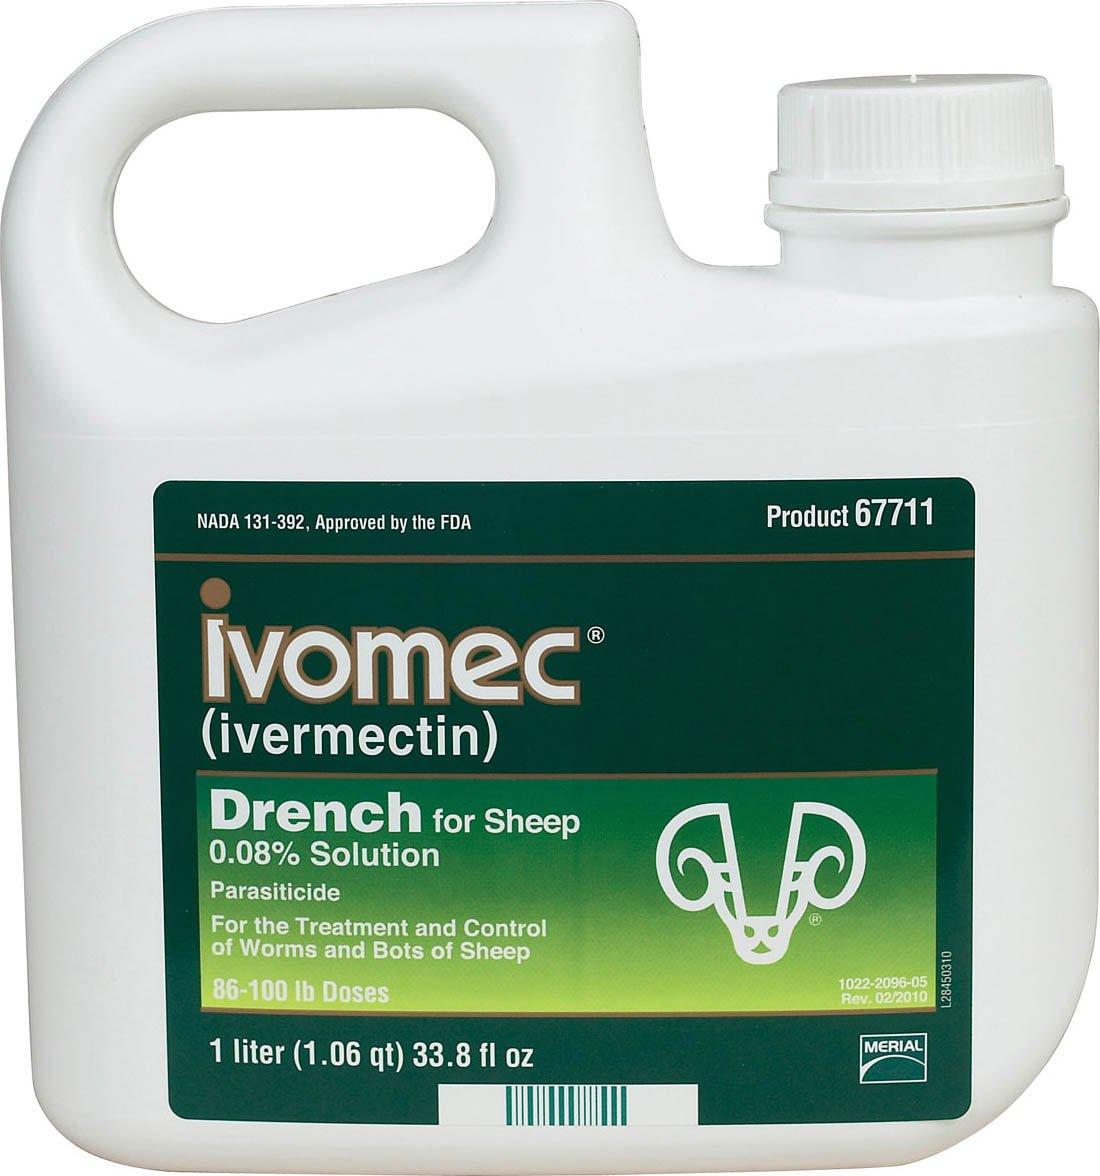 140921 Ivomec Parasiticide Drench for Sheep, 1 Liter Prime Pet Deals - Code 1 67710